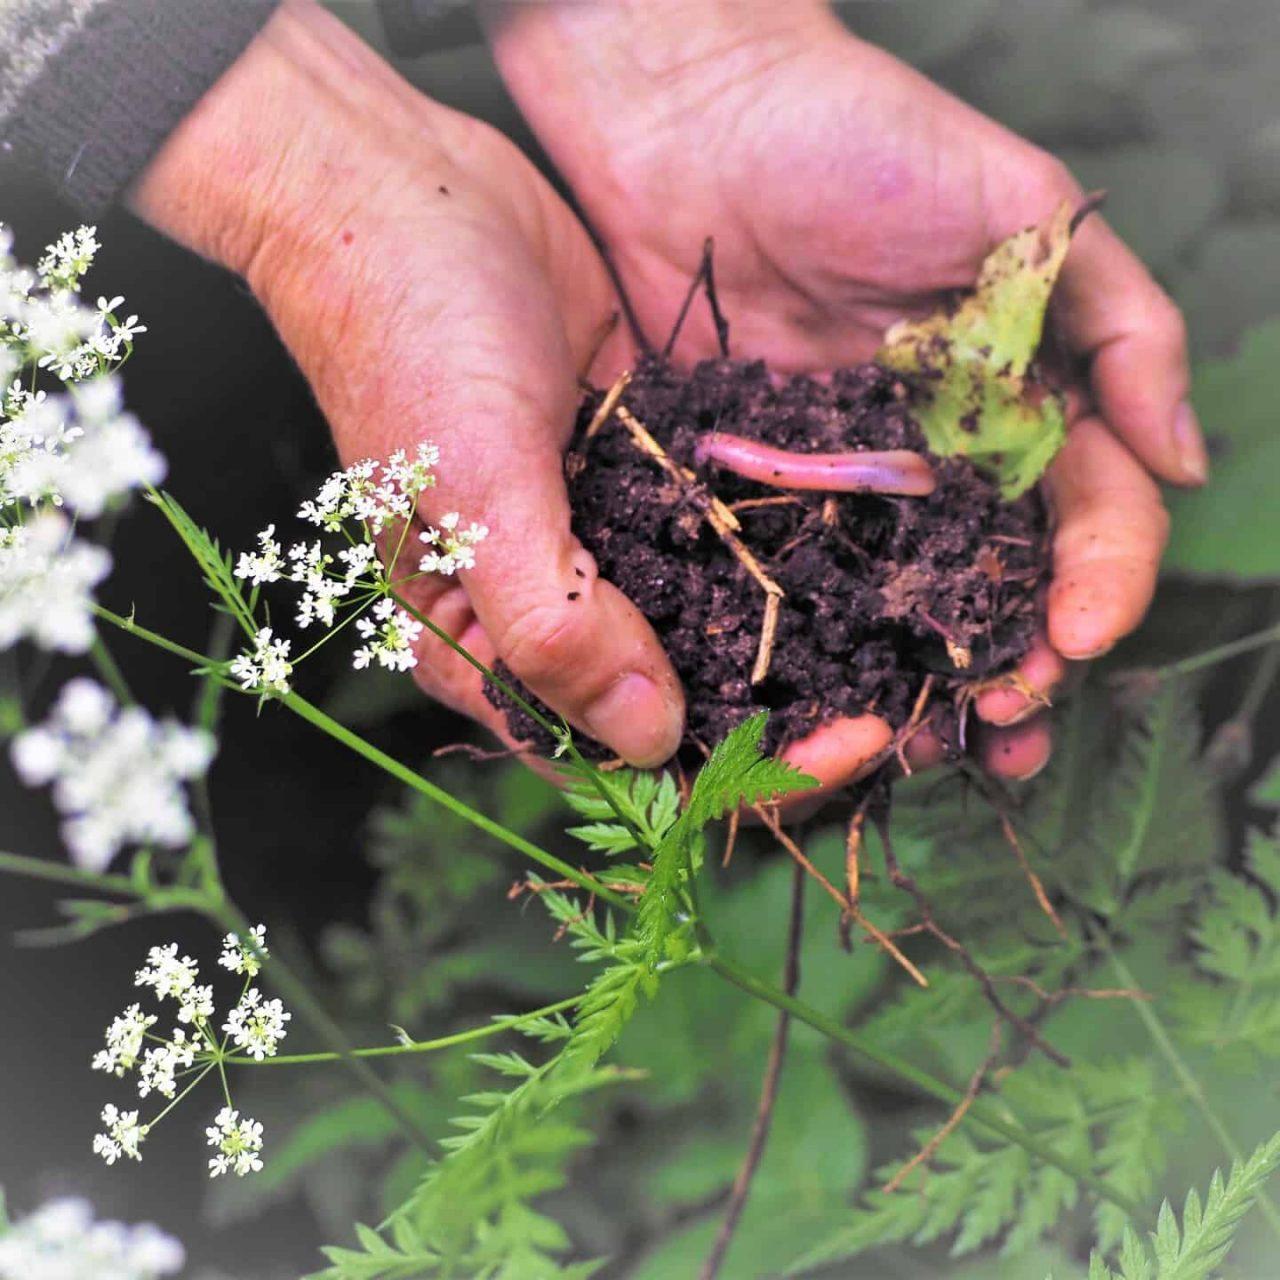 mens plant en dier Huis Sevenaer